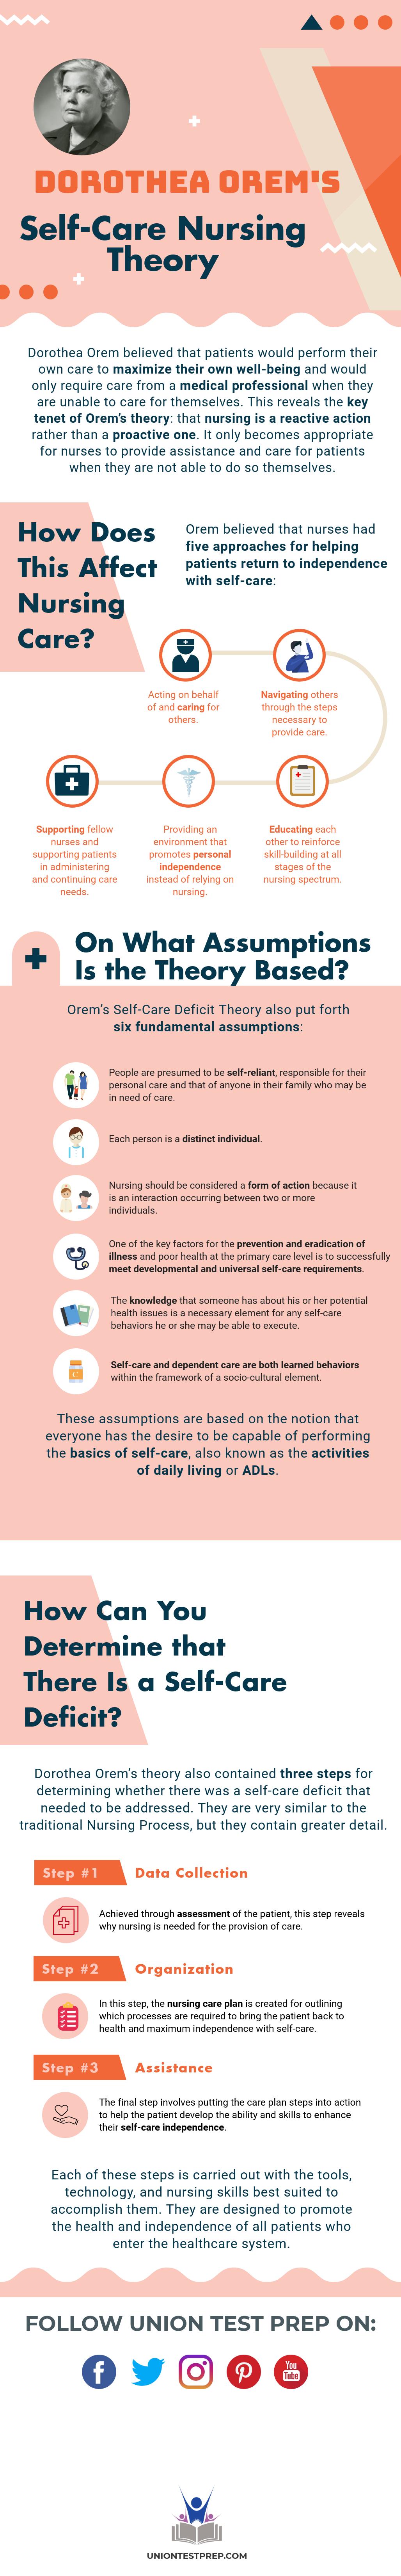 Application Of Orem's Self Care Model To Nursing Practice